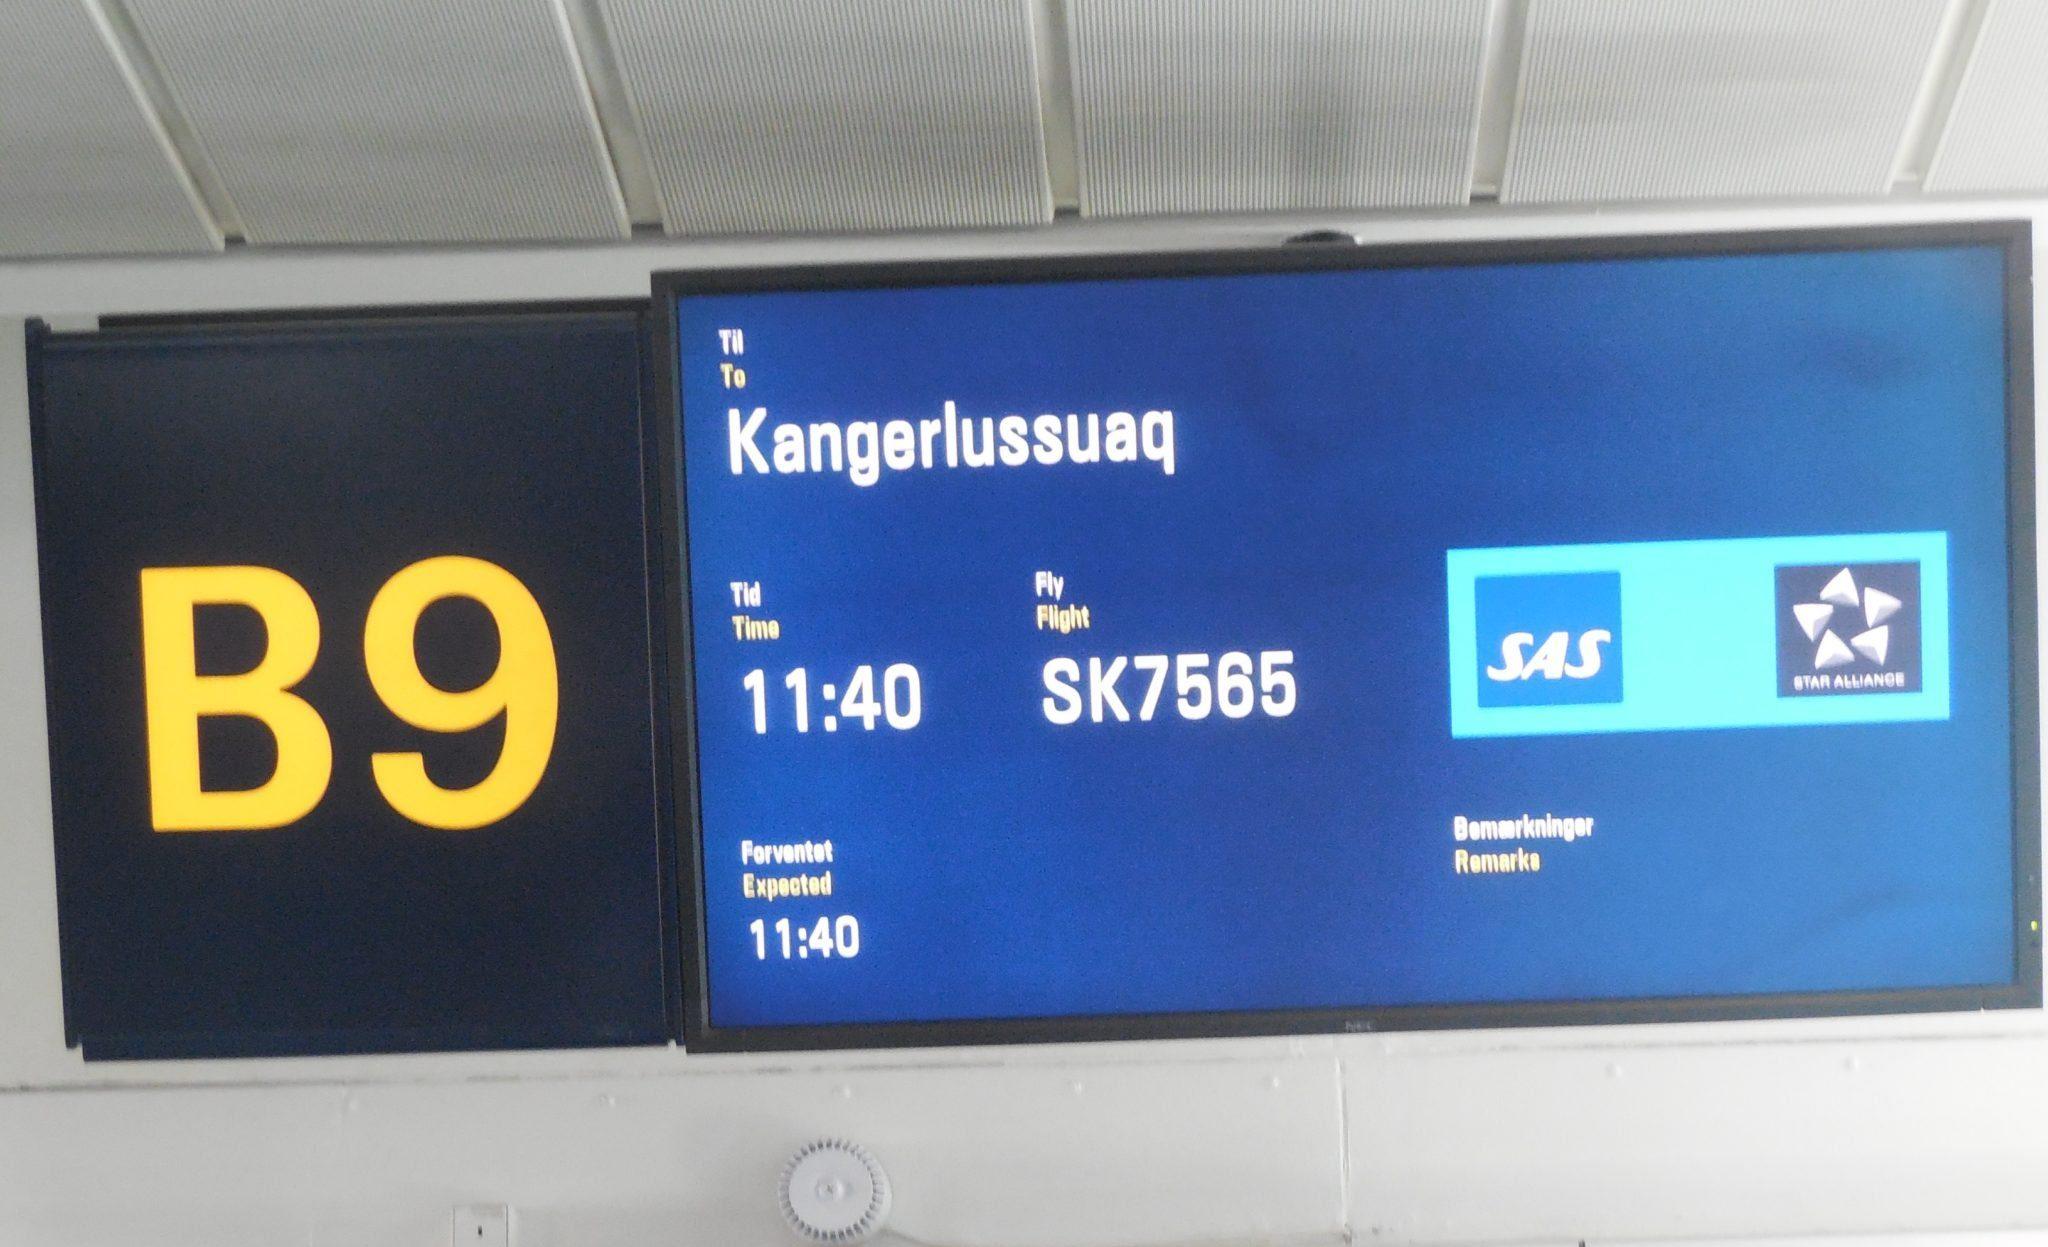 SAS-afgang til Kangerlussuaq fra CPH Gate B9. (Foto: Sheila Simkin)